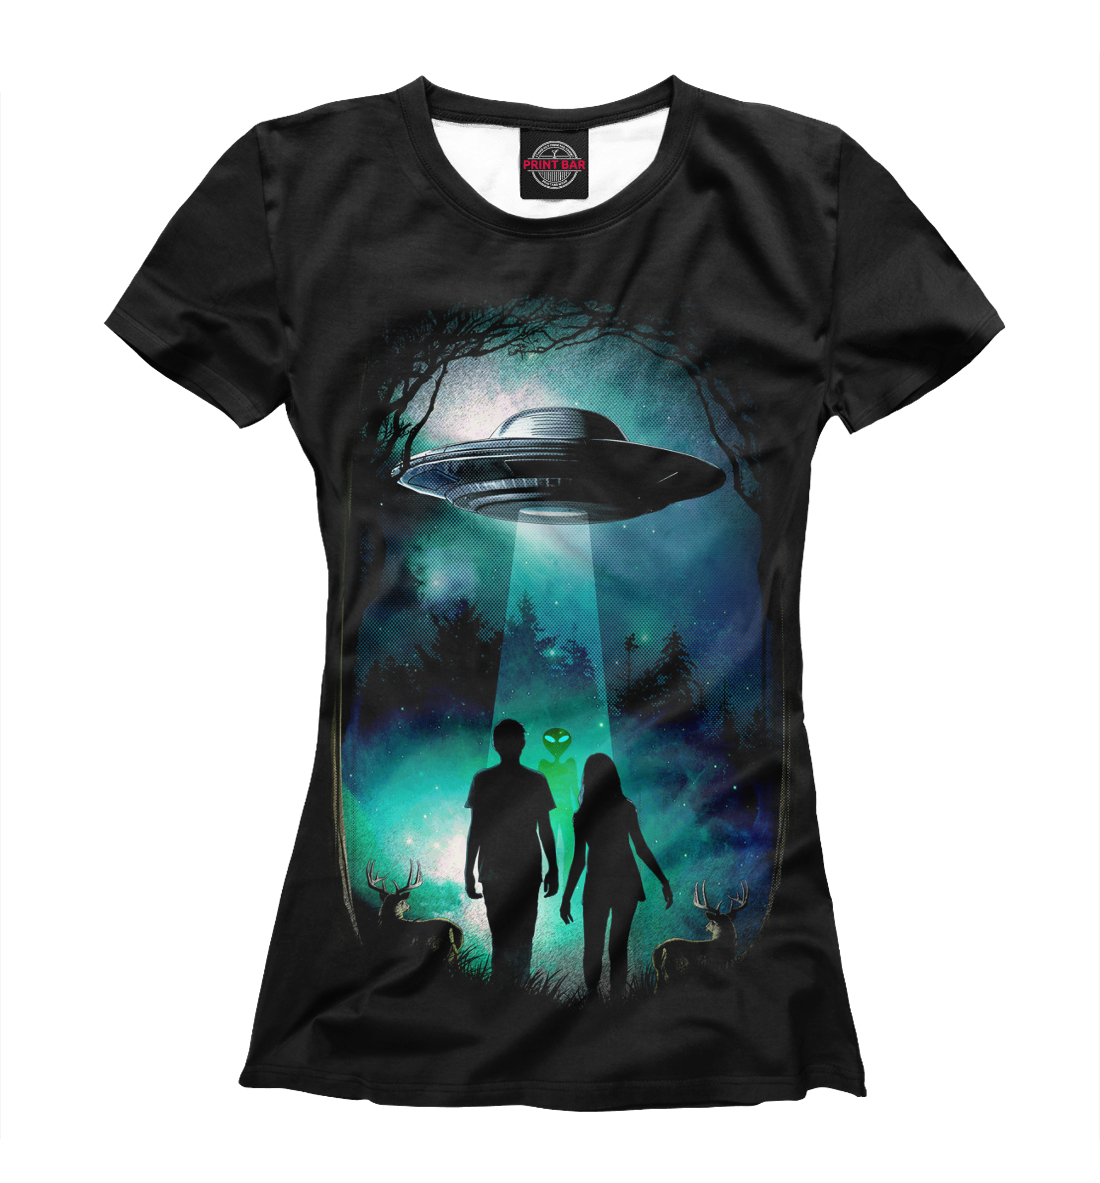 Купить Aliens, Printbar, Футболки, APD-757970-fut-1